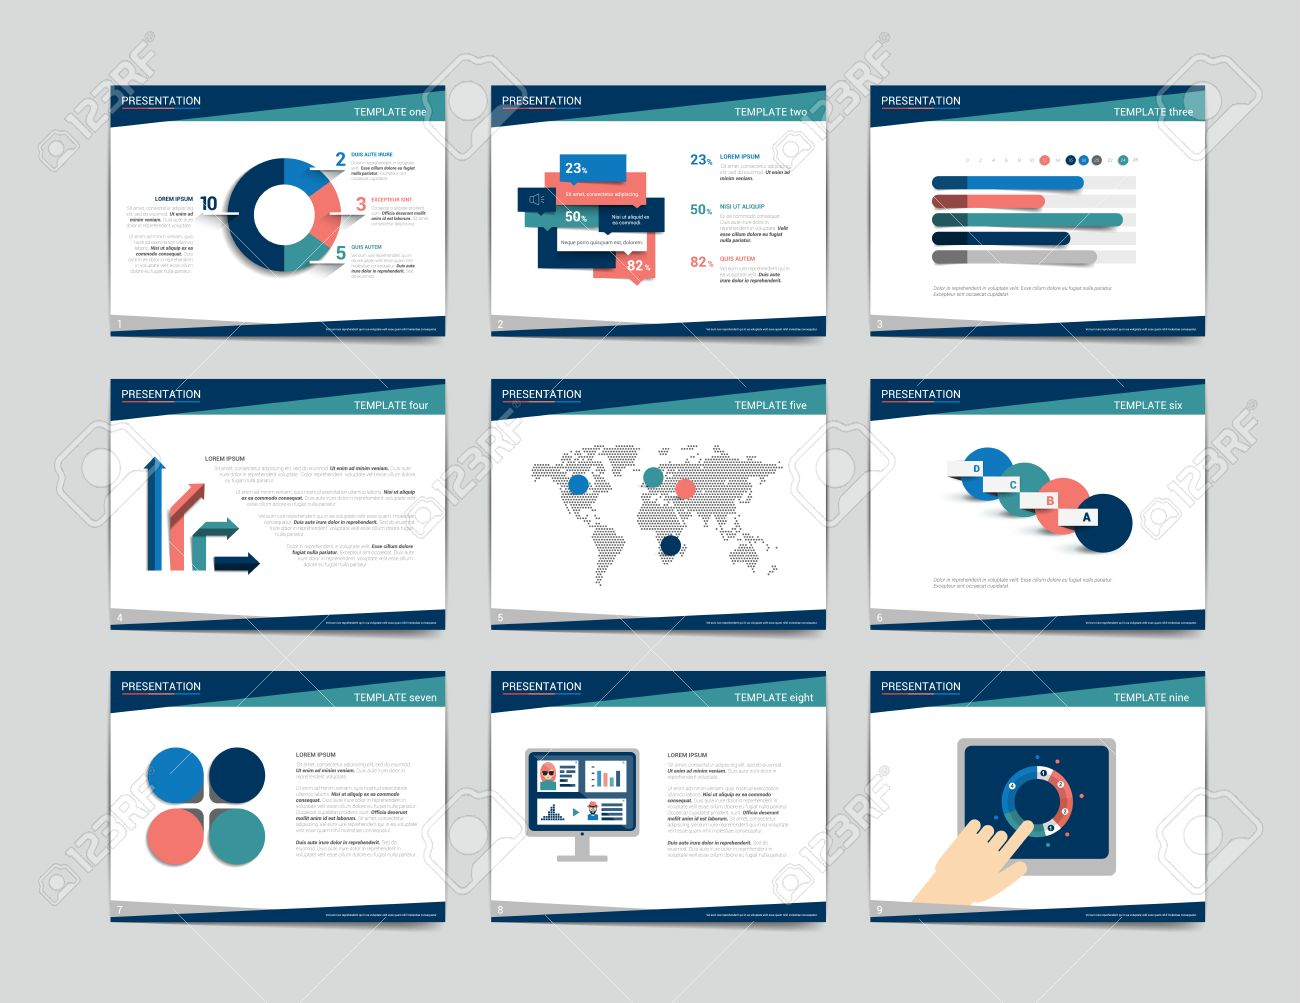 Good 9 Business Presentation Templates. Infographics For Leaflet, Poster, Slide,  Magazine, Book Pictures